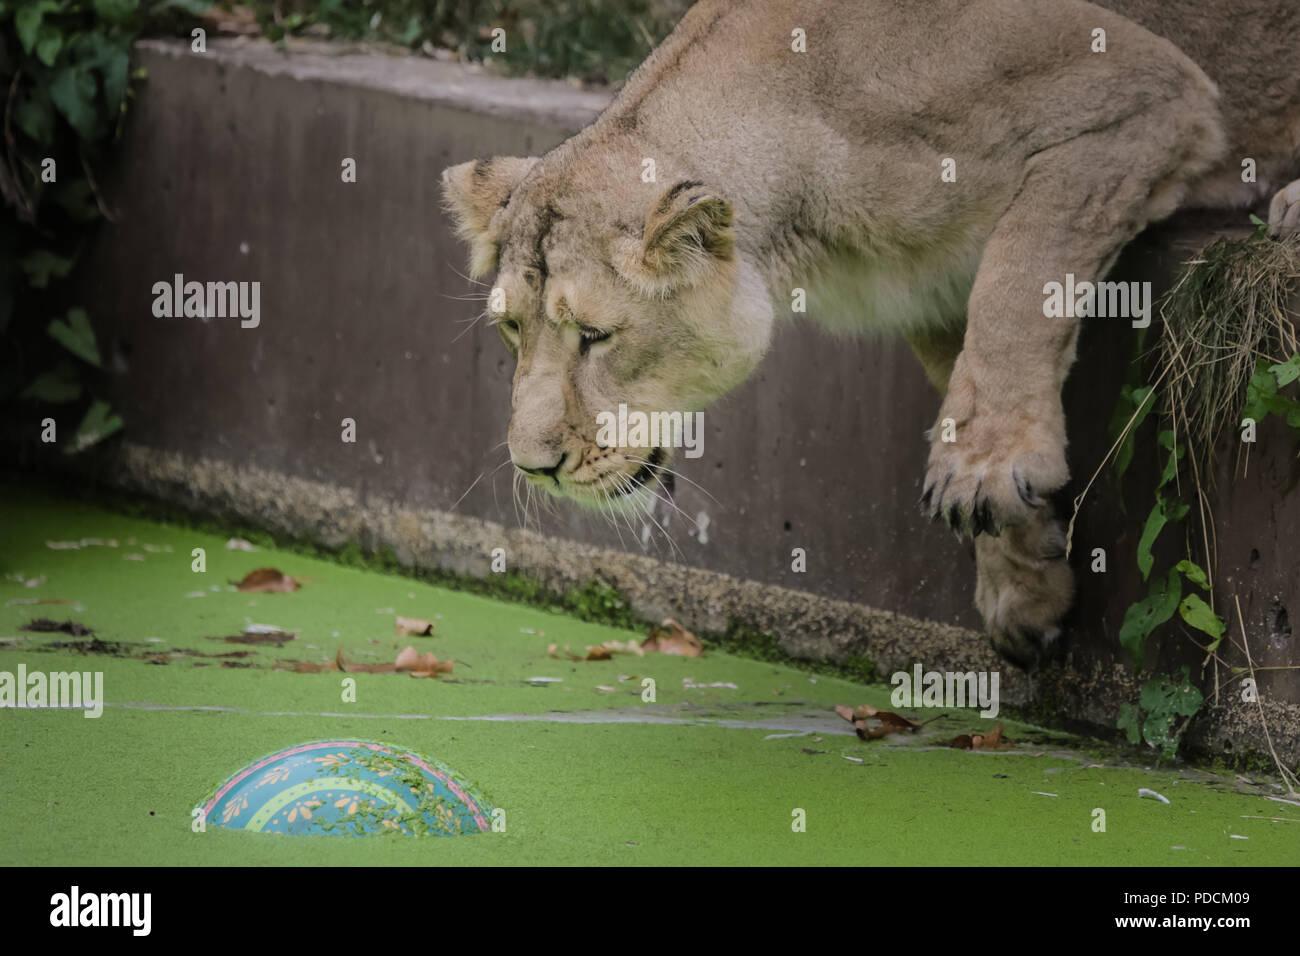 London, UK. 9th August, 2018. ZSL London Zoo's Asiatic lionesses celebrate World Lion Day. Credit: Chris Aubrey/Alamy Live News Stock Photo